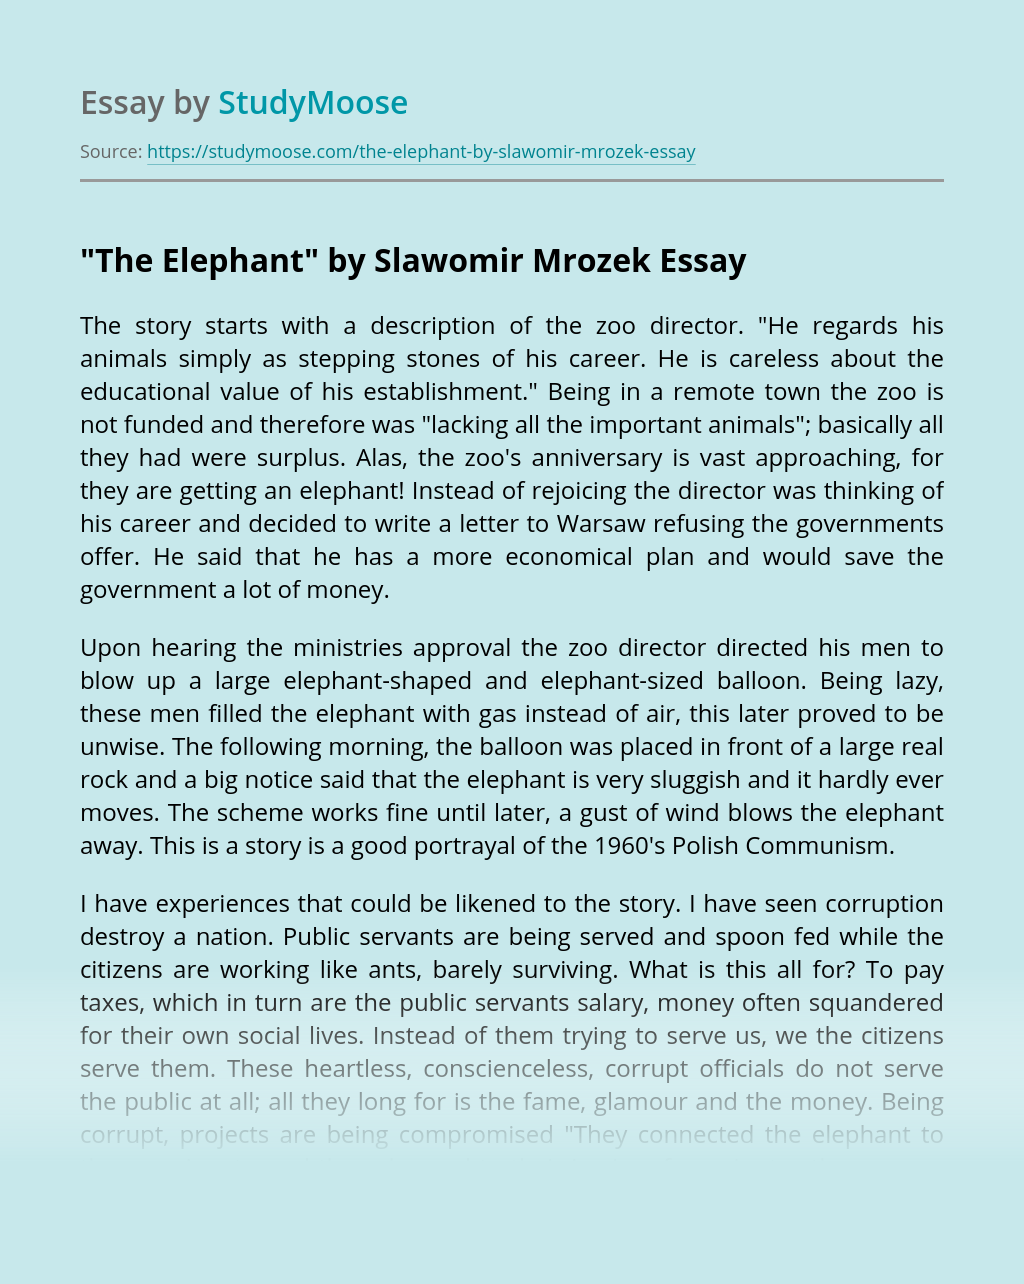 """The Elephant"" by Slawomir Mrozek"